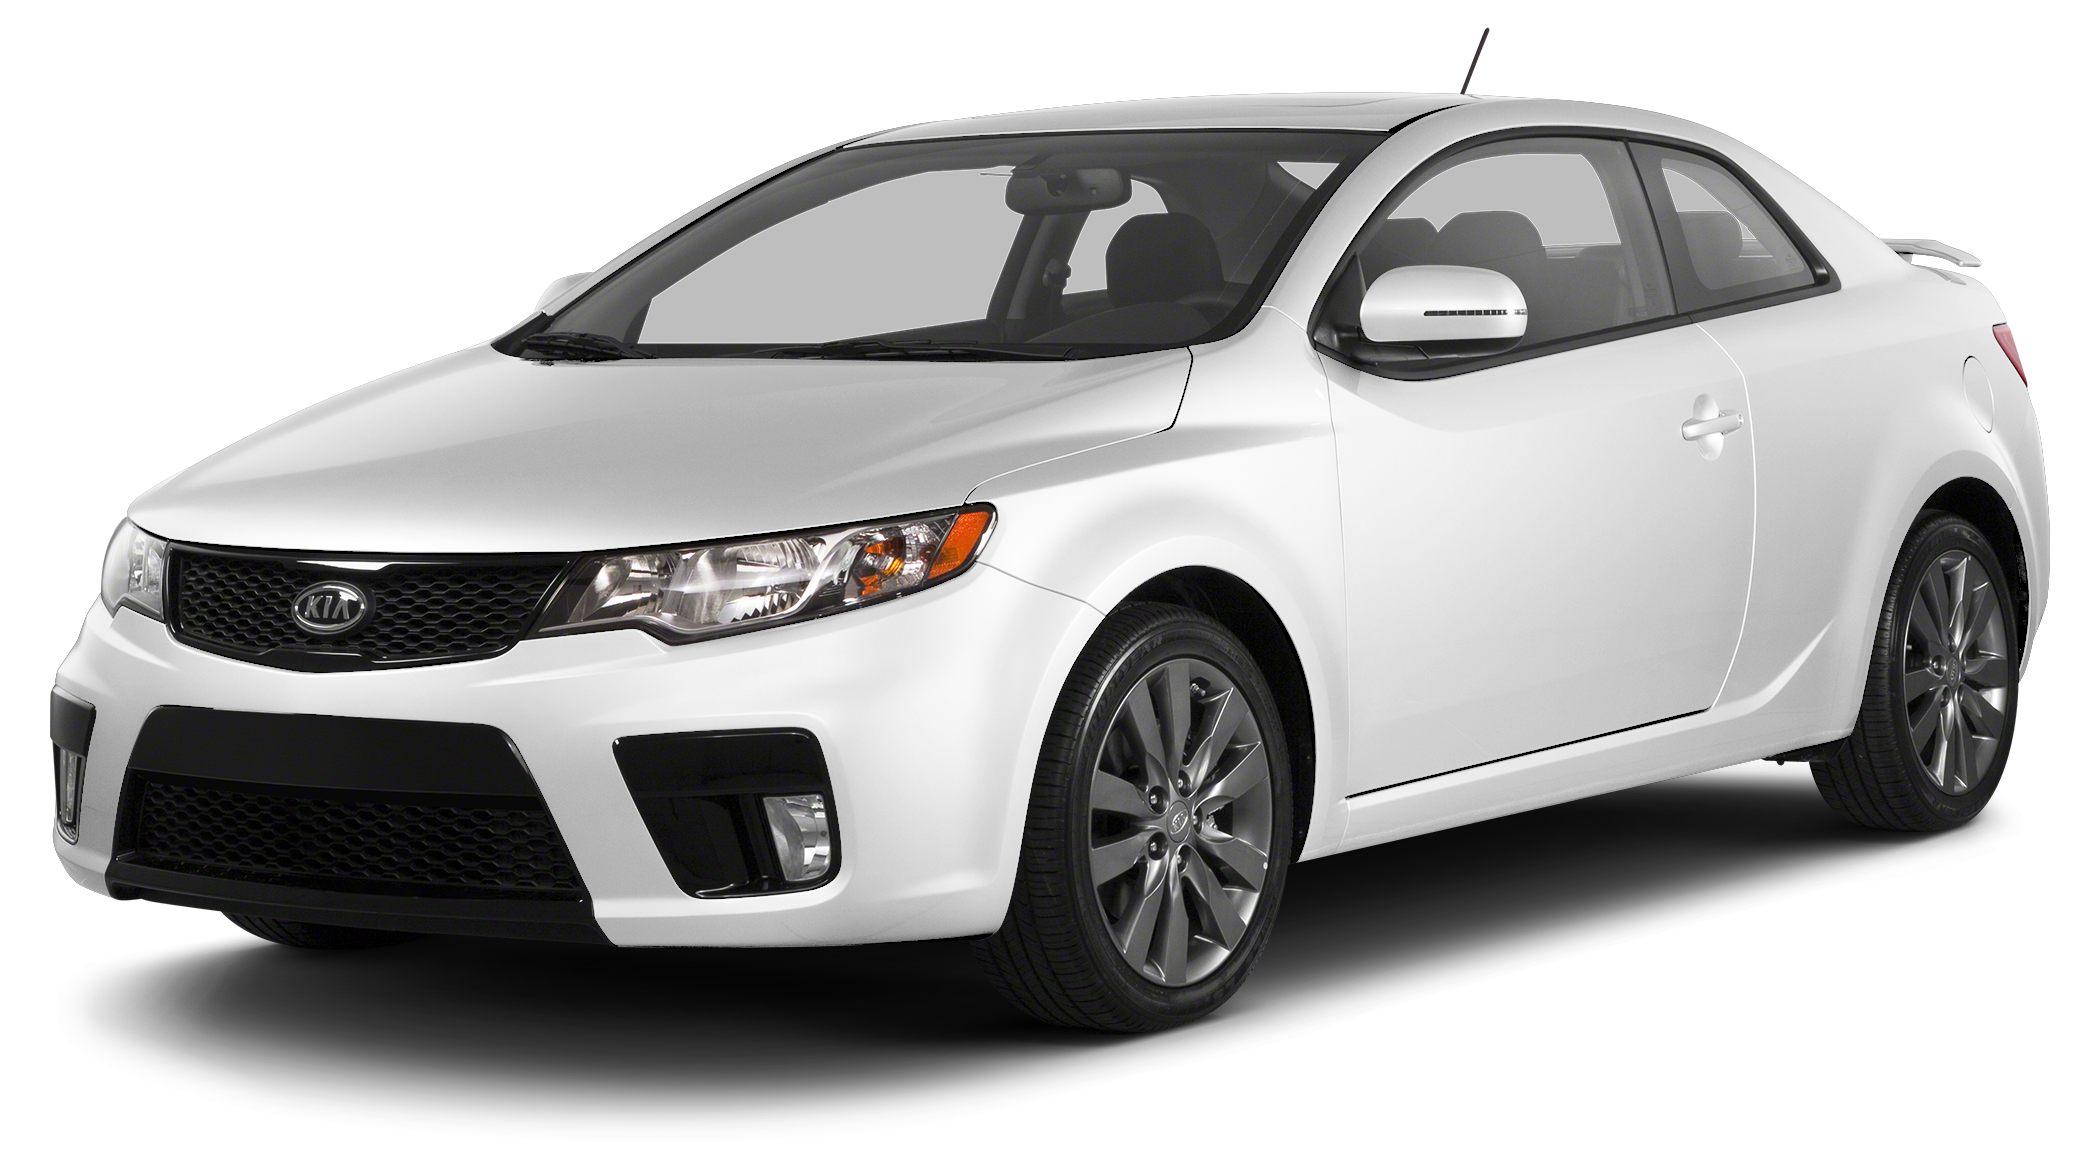 2013 Kia Forte Koup EX Miles 46969Color White Stock 18679 VIN KNAFU6A23D5743968